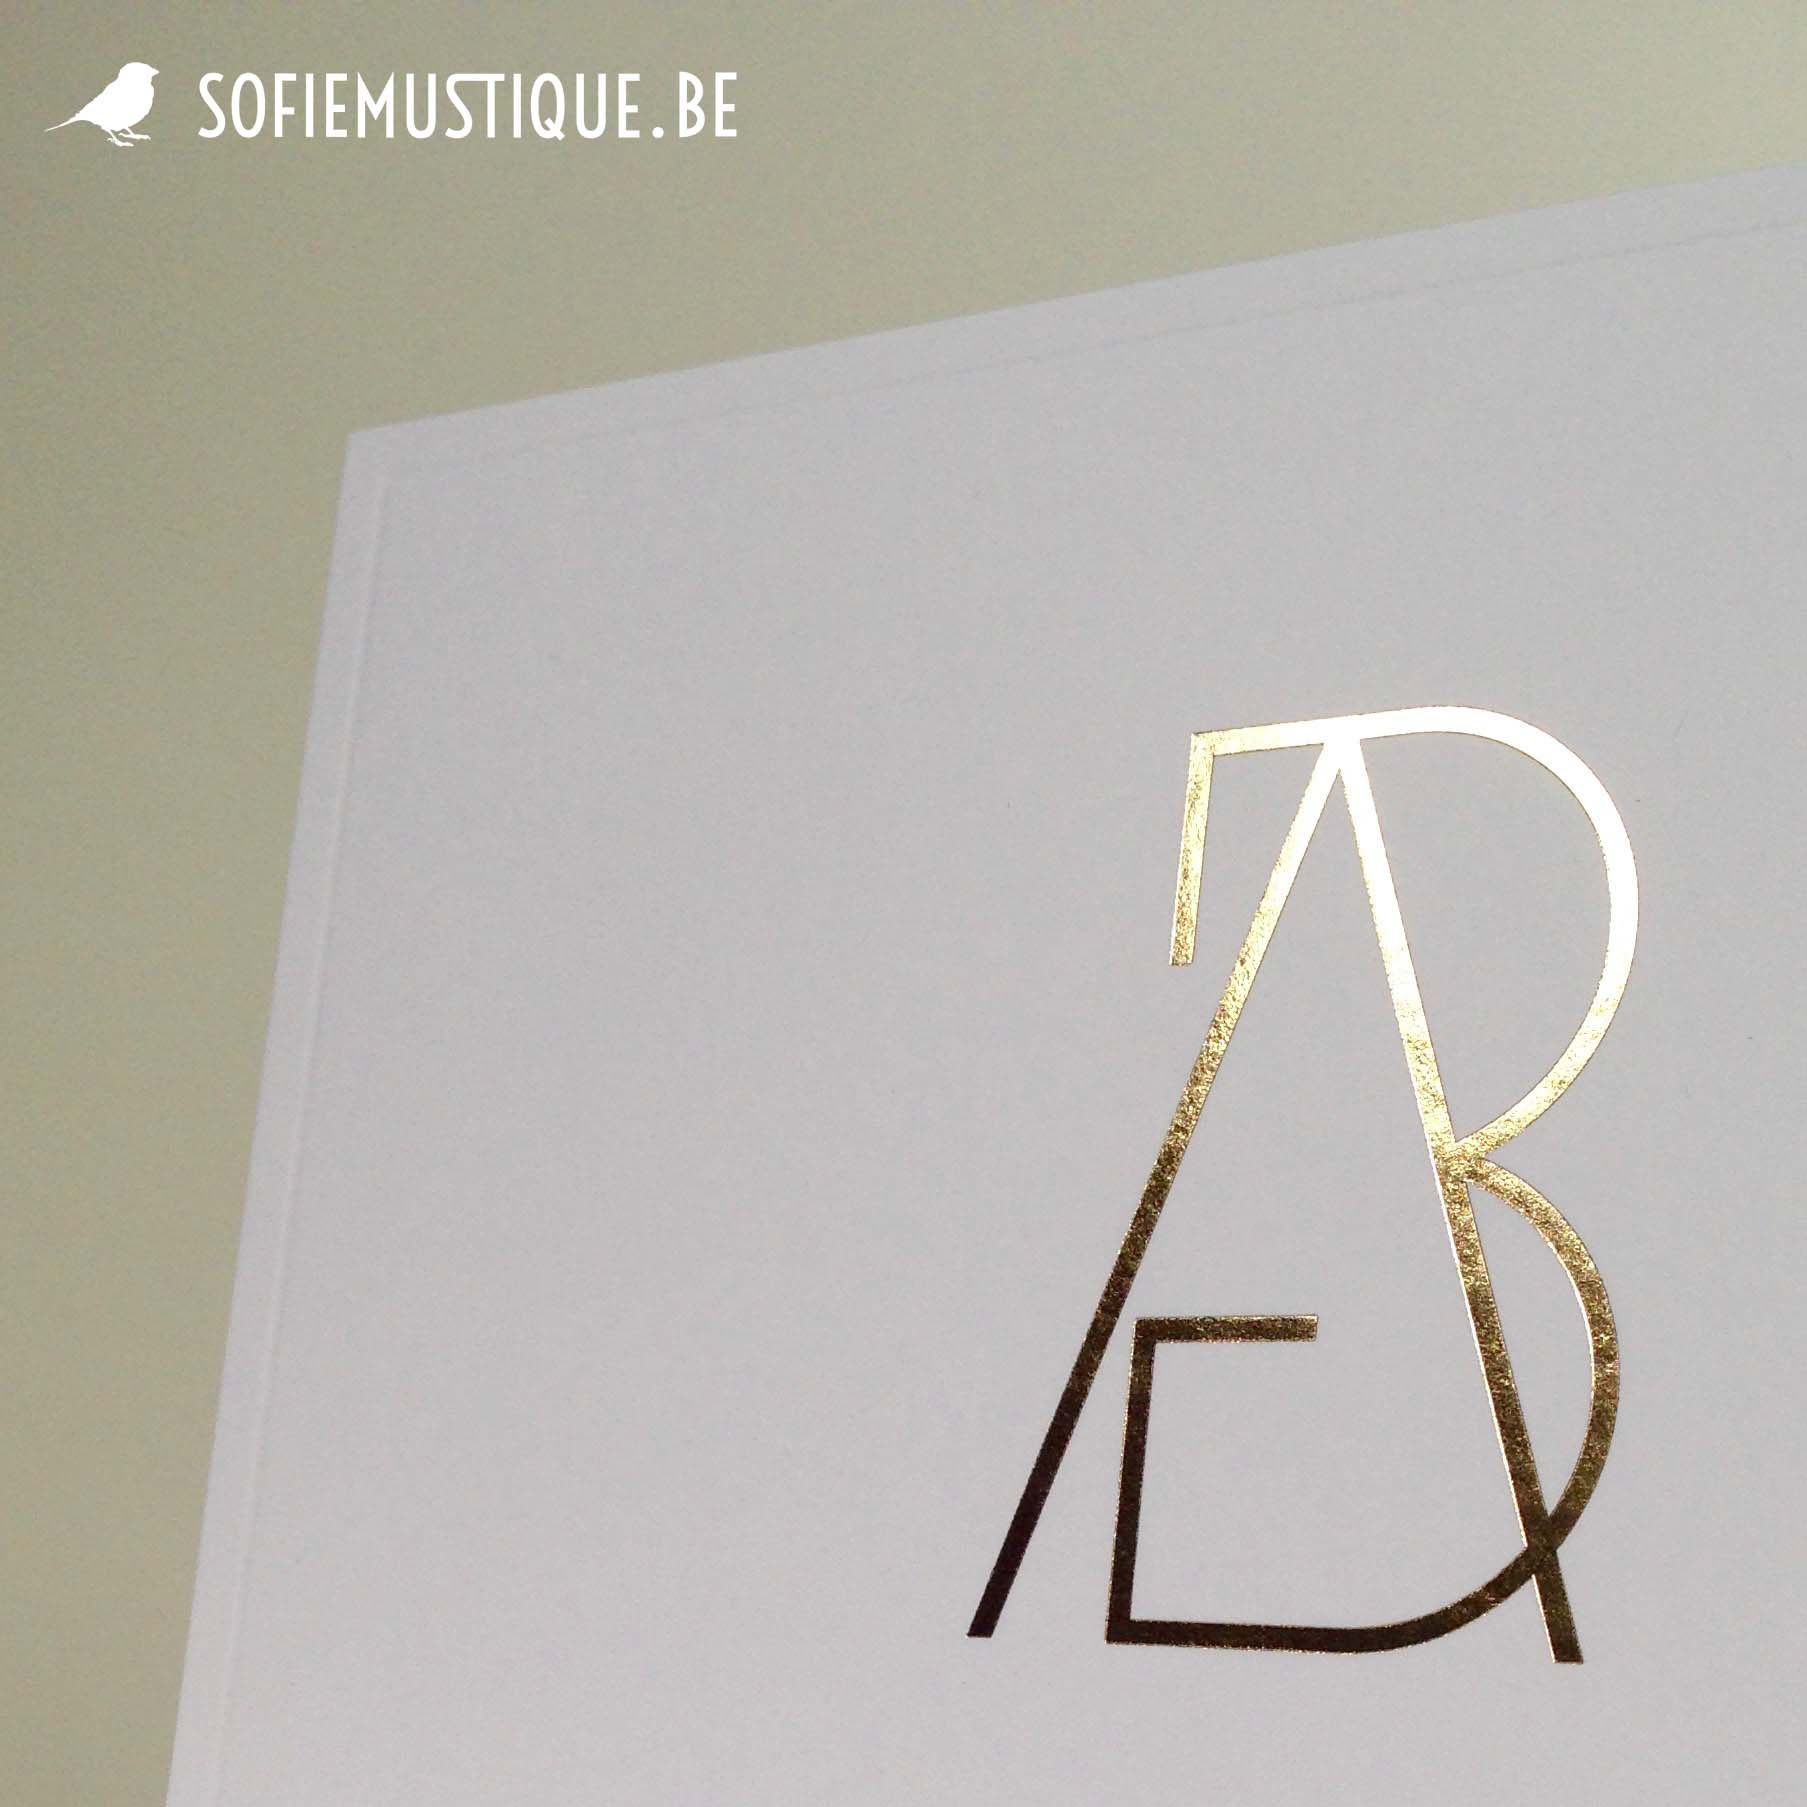 Huwelijksuitnodiging / wedding invitation Anneke & Bert   goudfolie, gold hot foil, logo